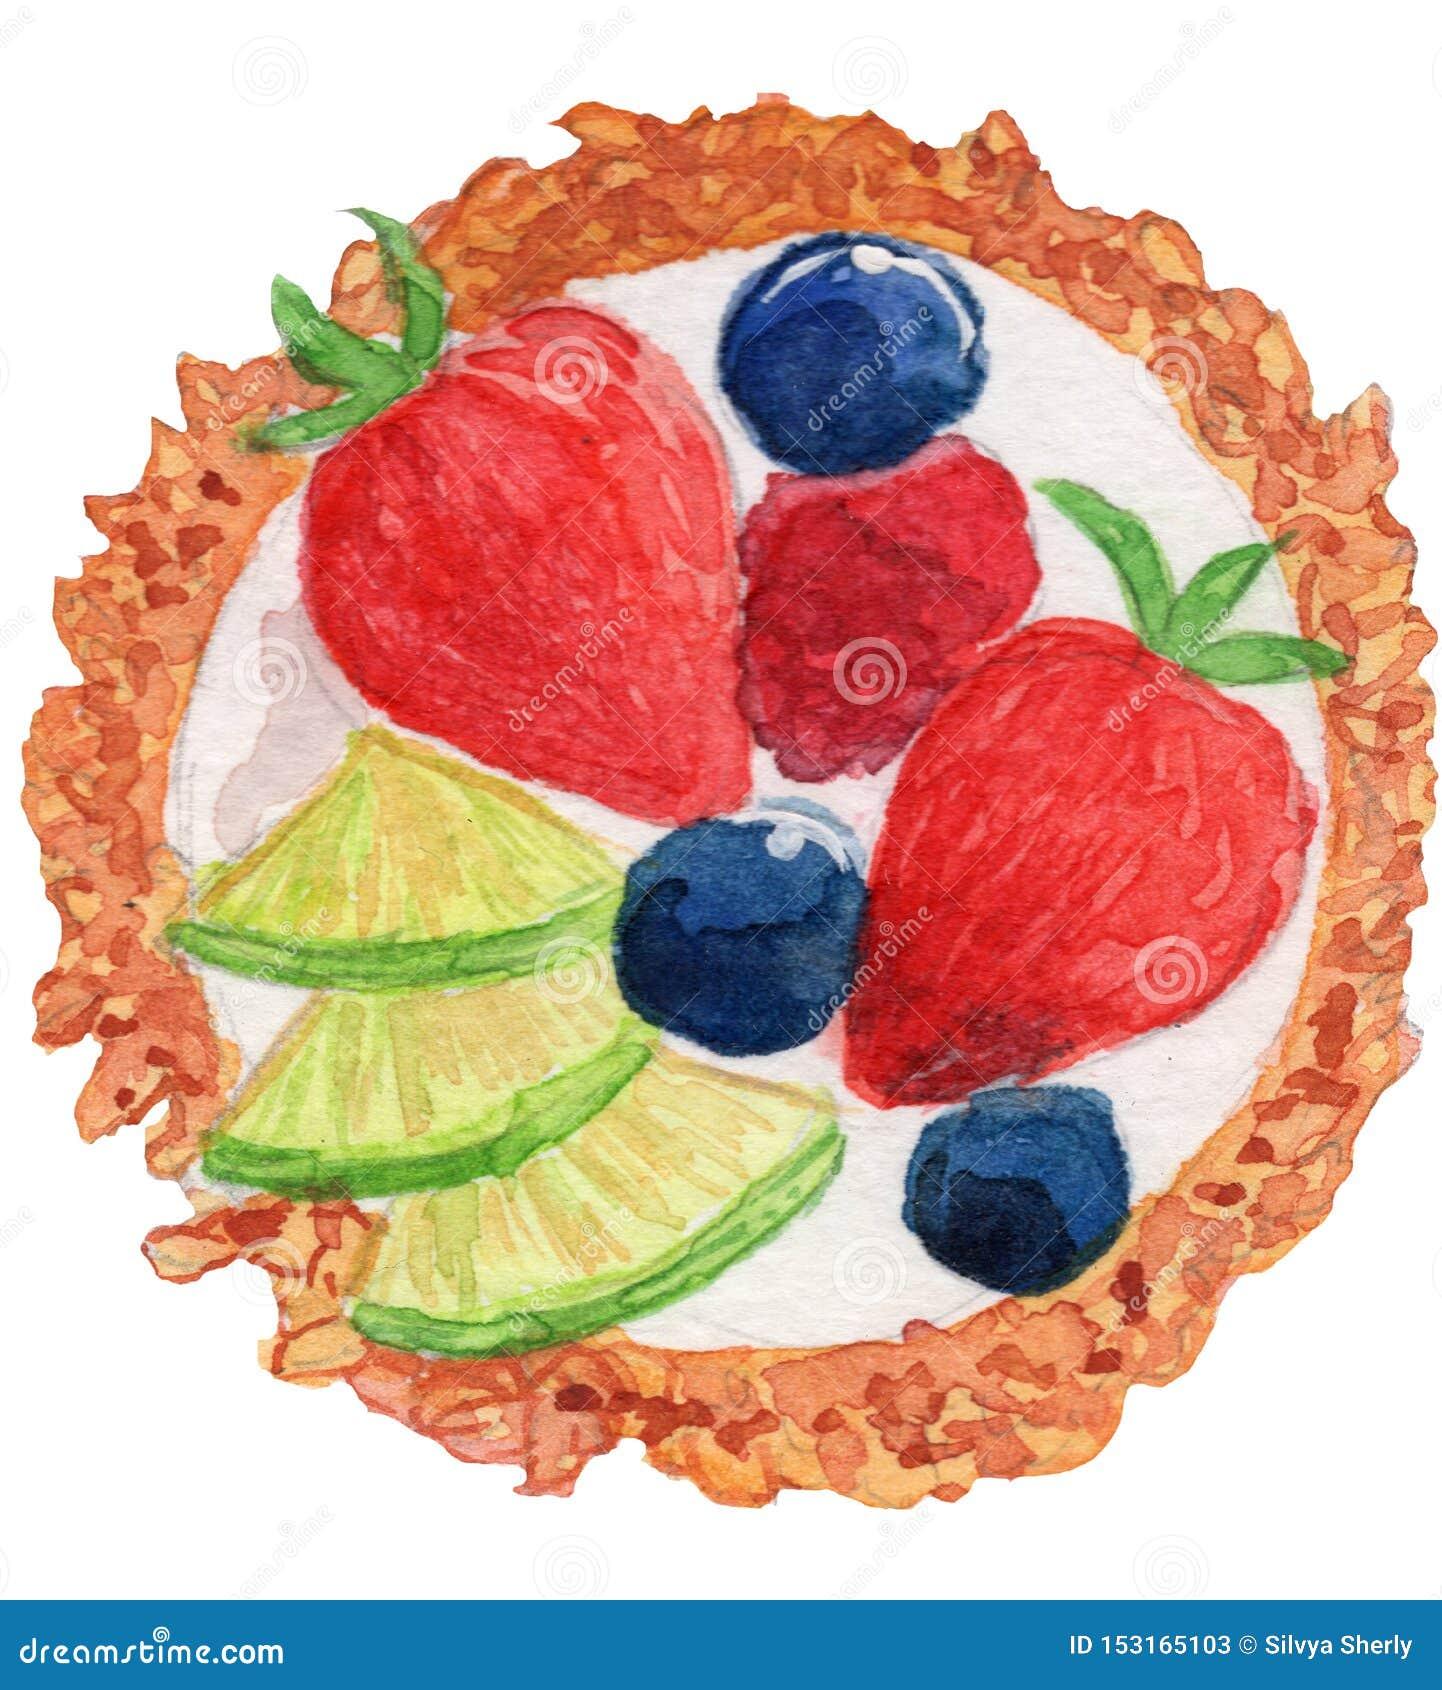 Fruit Tart Watercolor Illustration